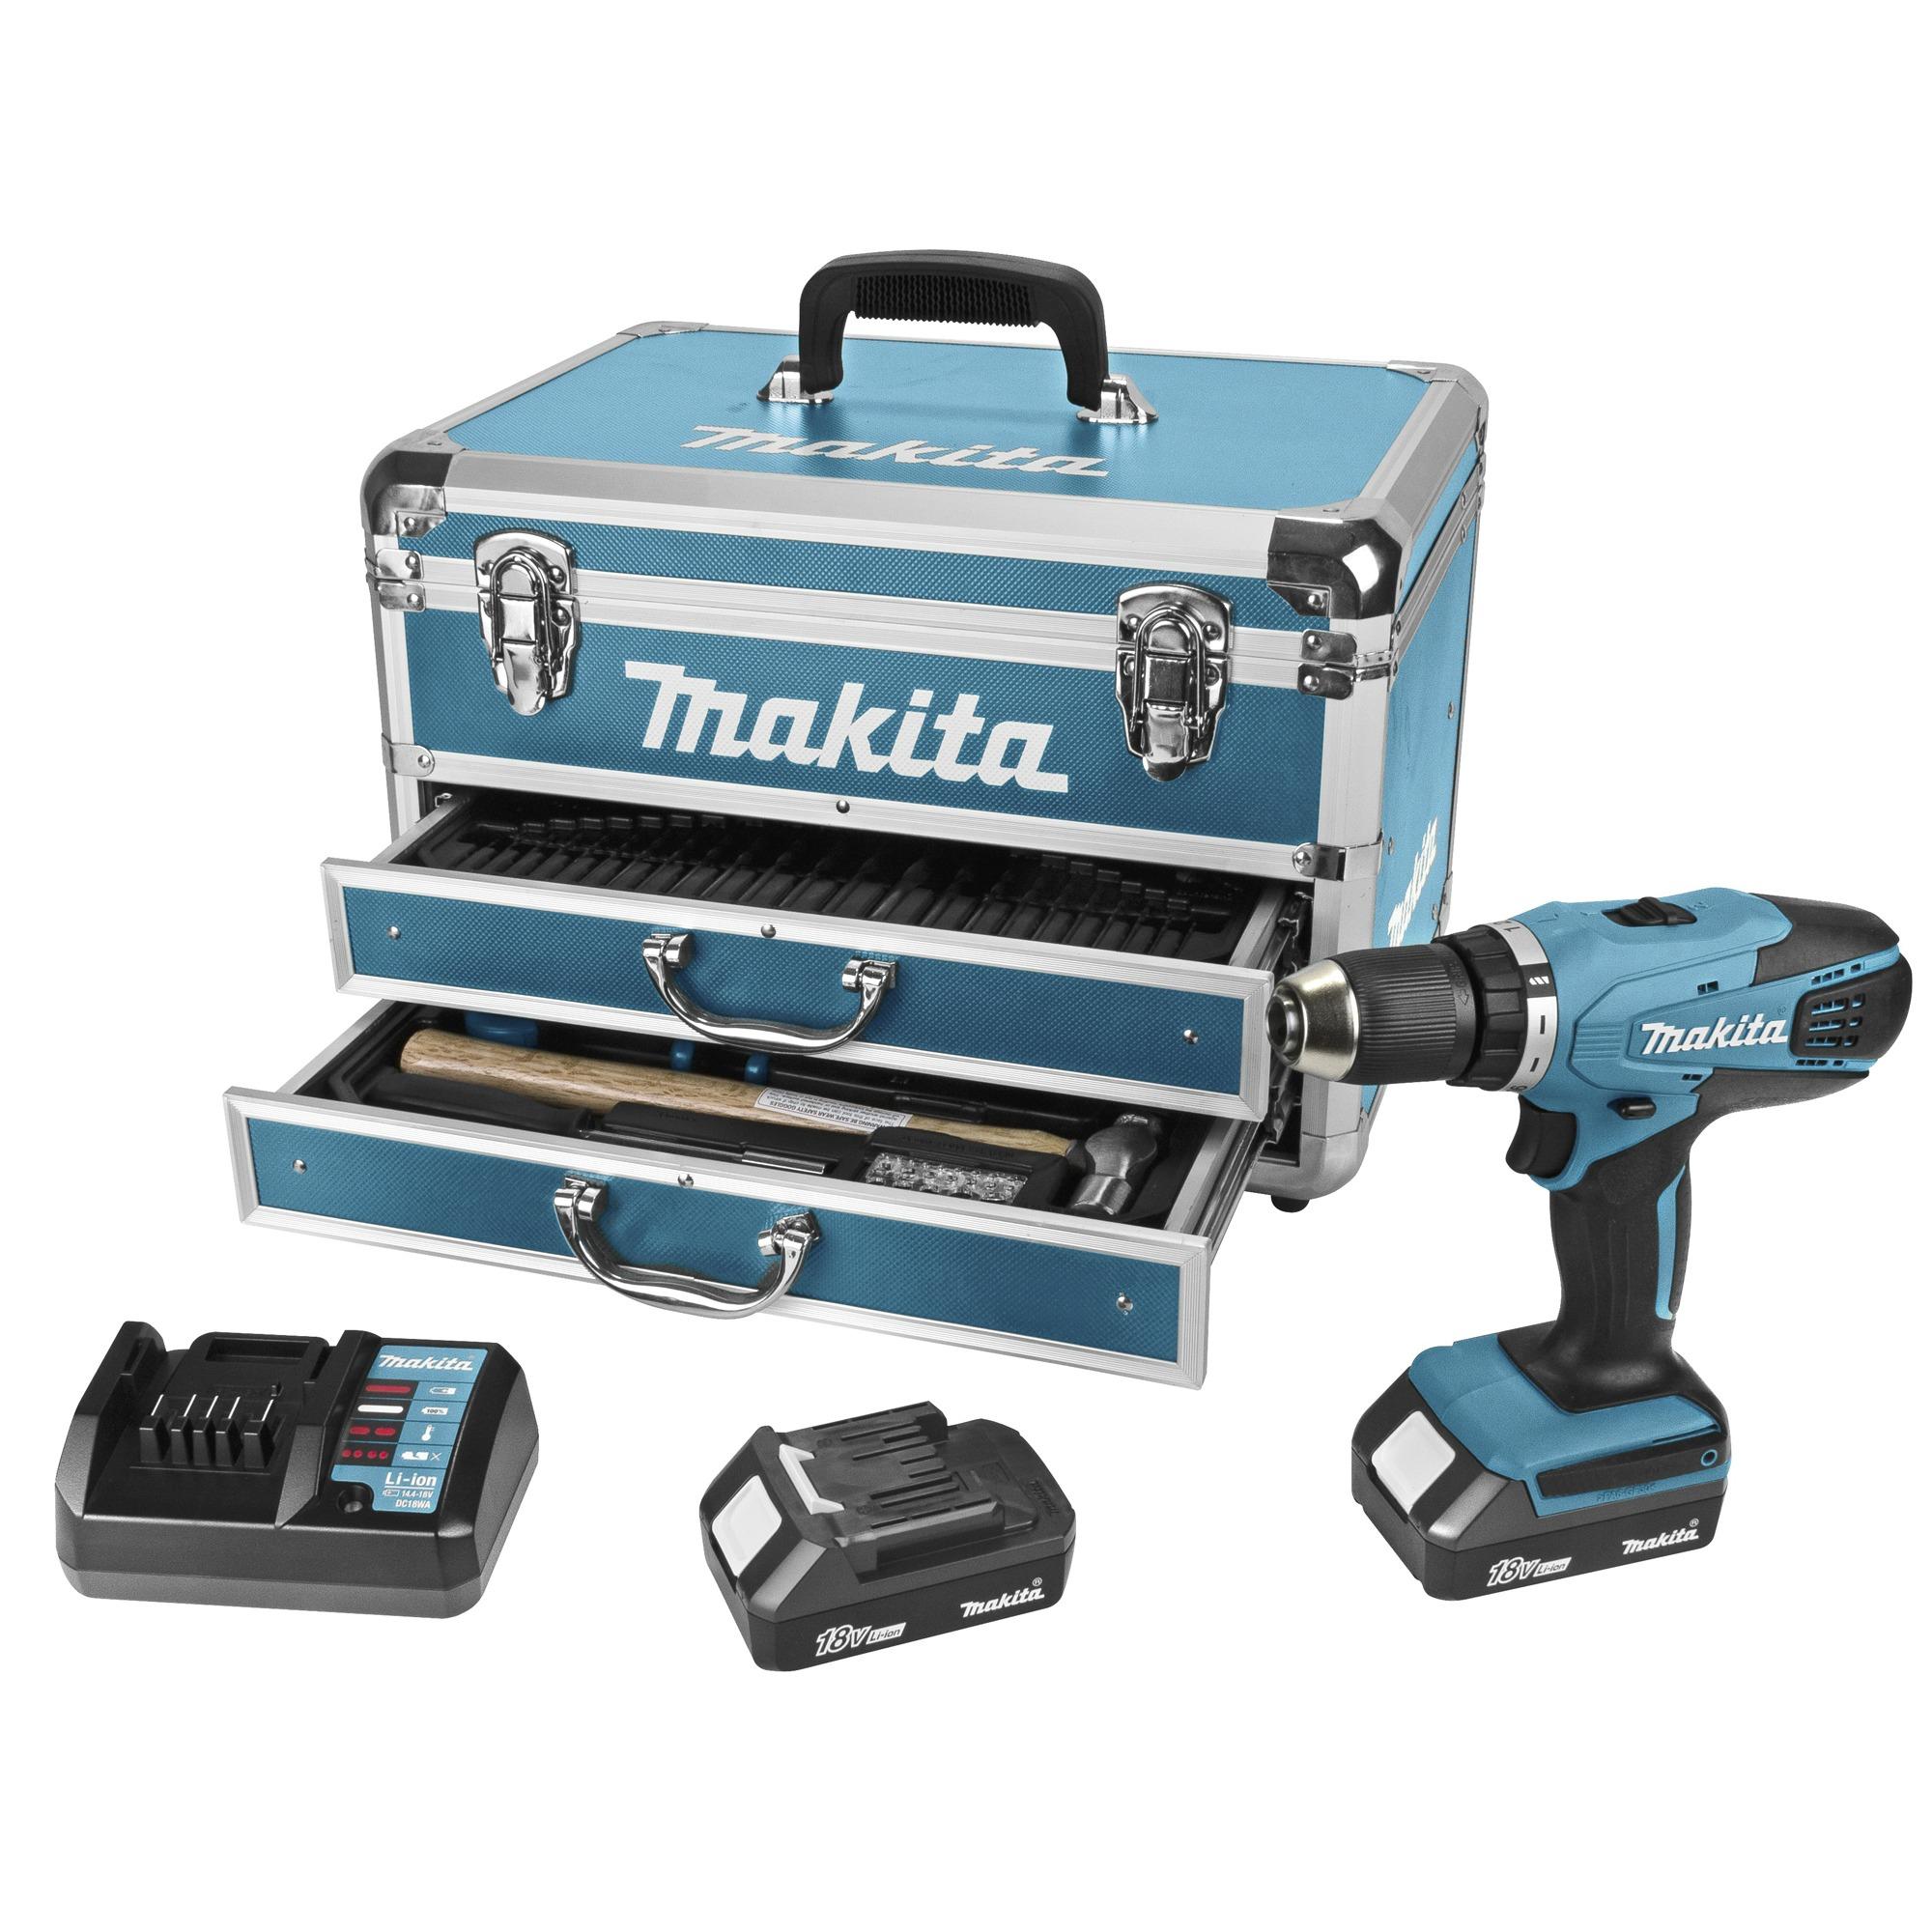 Makita accuboormachine DF457DWEX6 18V + 102-delige accessoireset